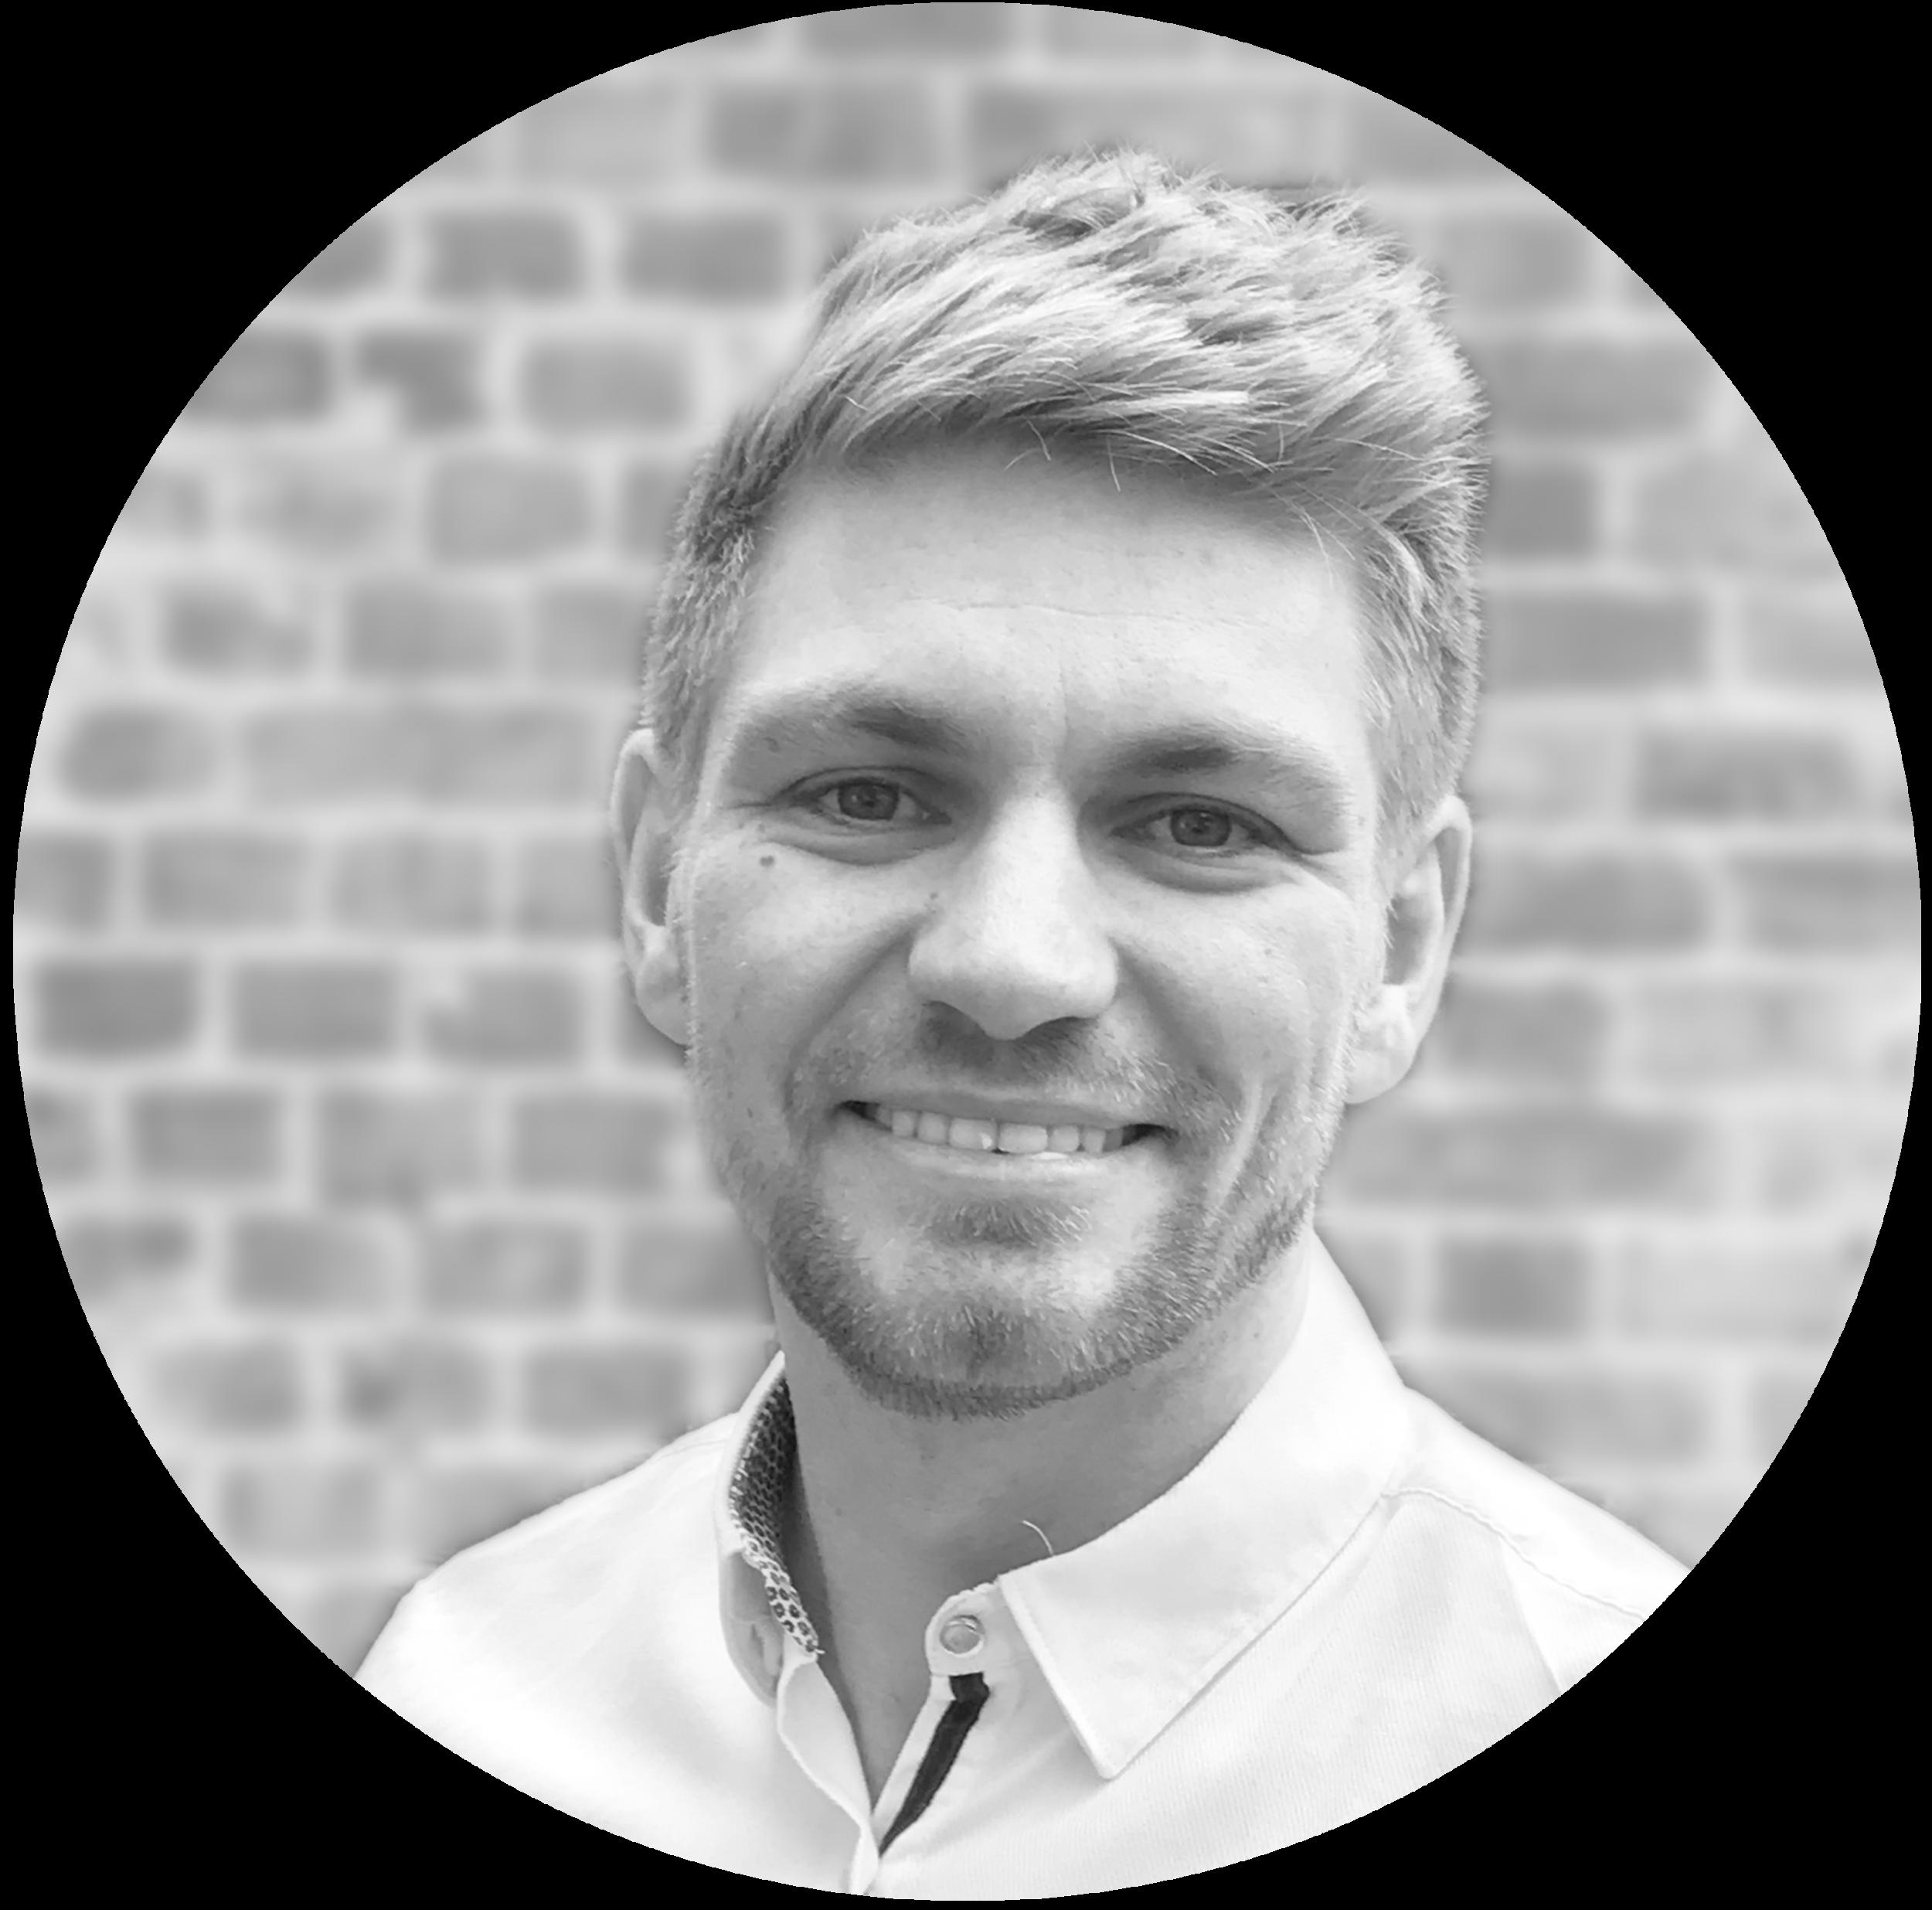 Matthew Fletcher, Commercial Director